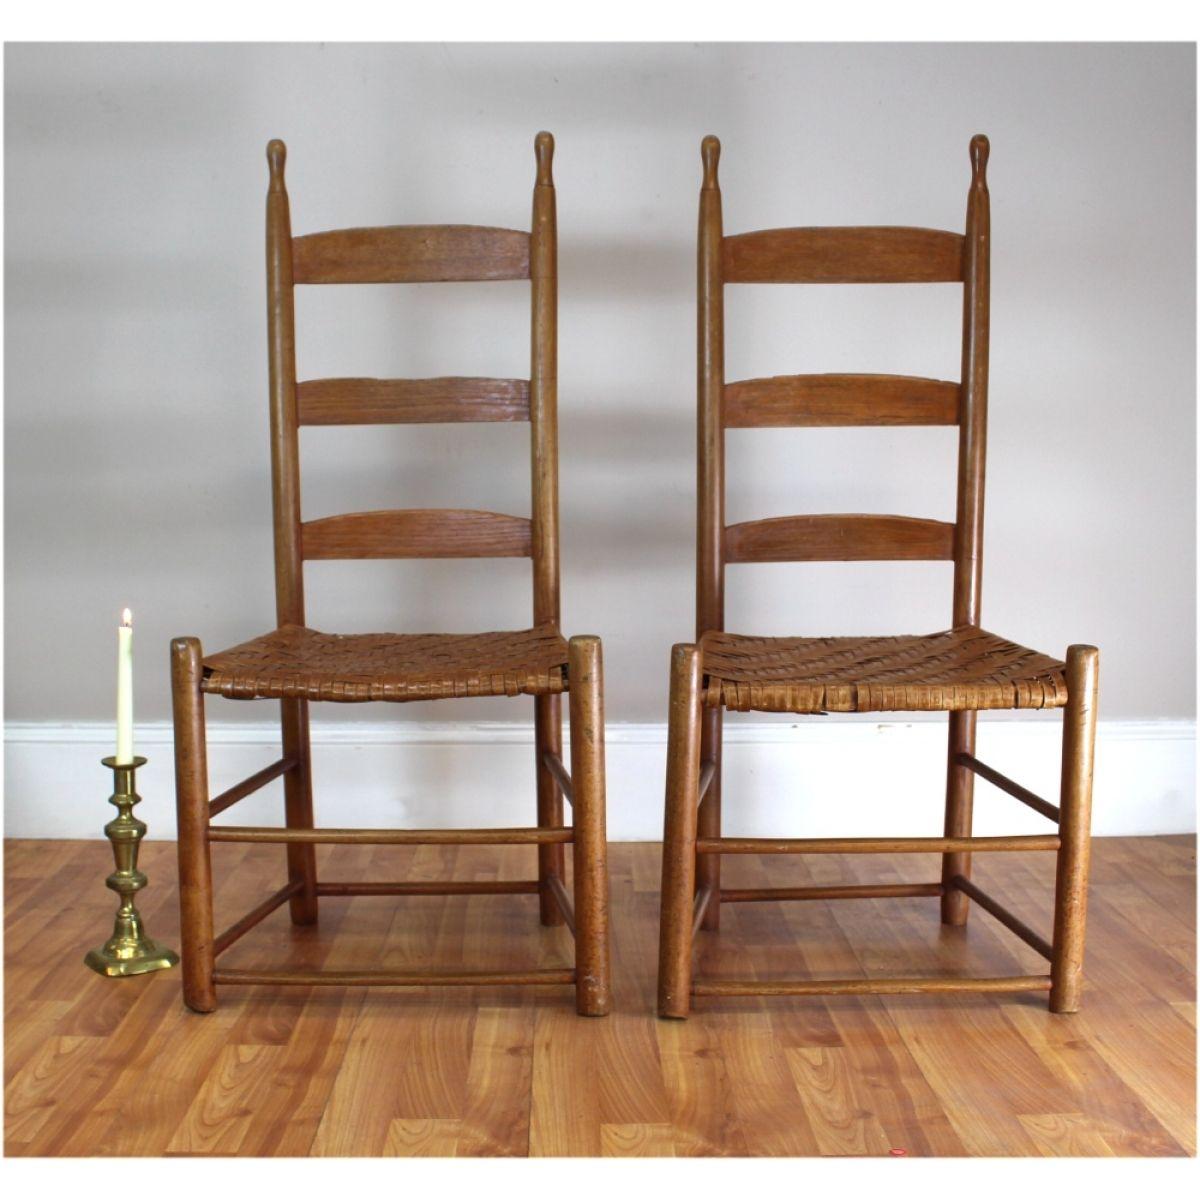 shaker ladder back chair white outdoor chairs kmart antique ladderback pair of split